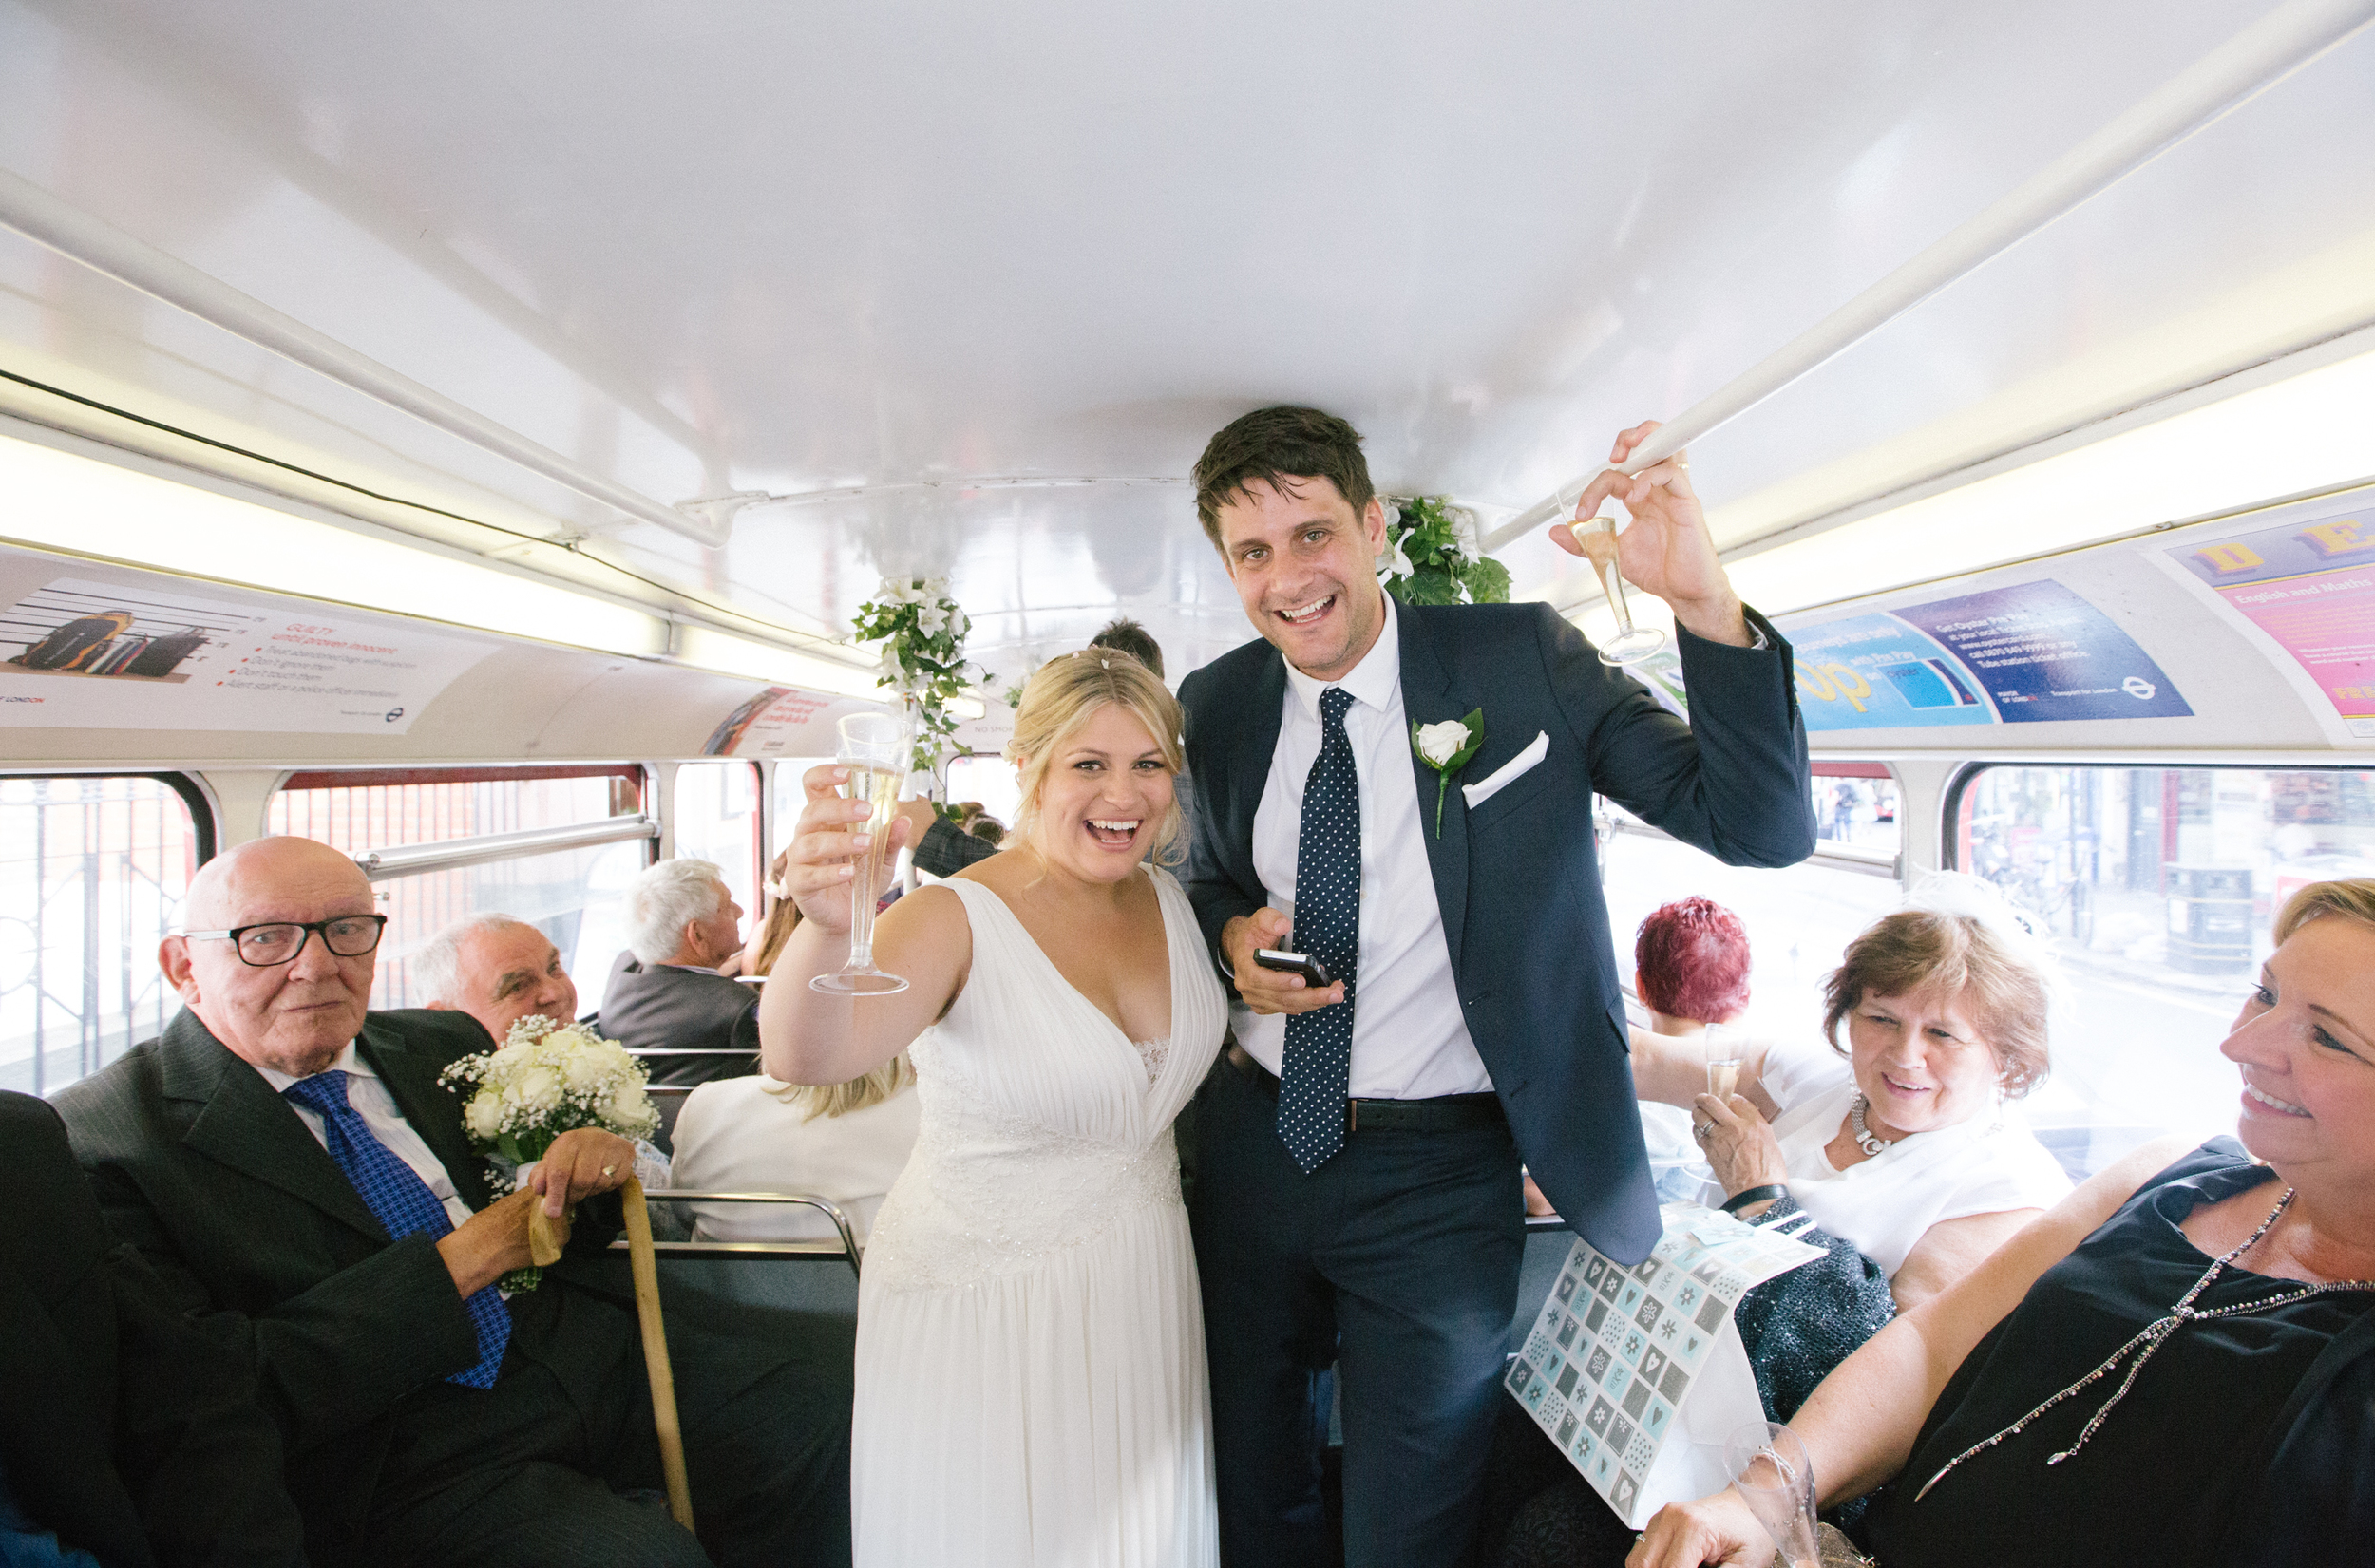 routemaster-bus-wedding-toast-1